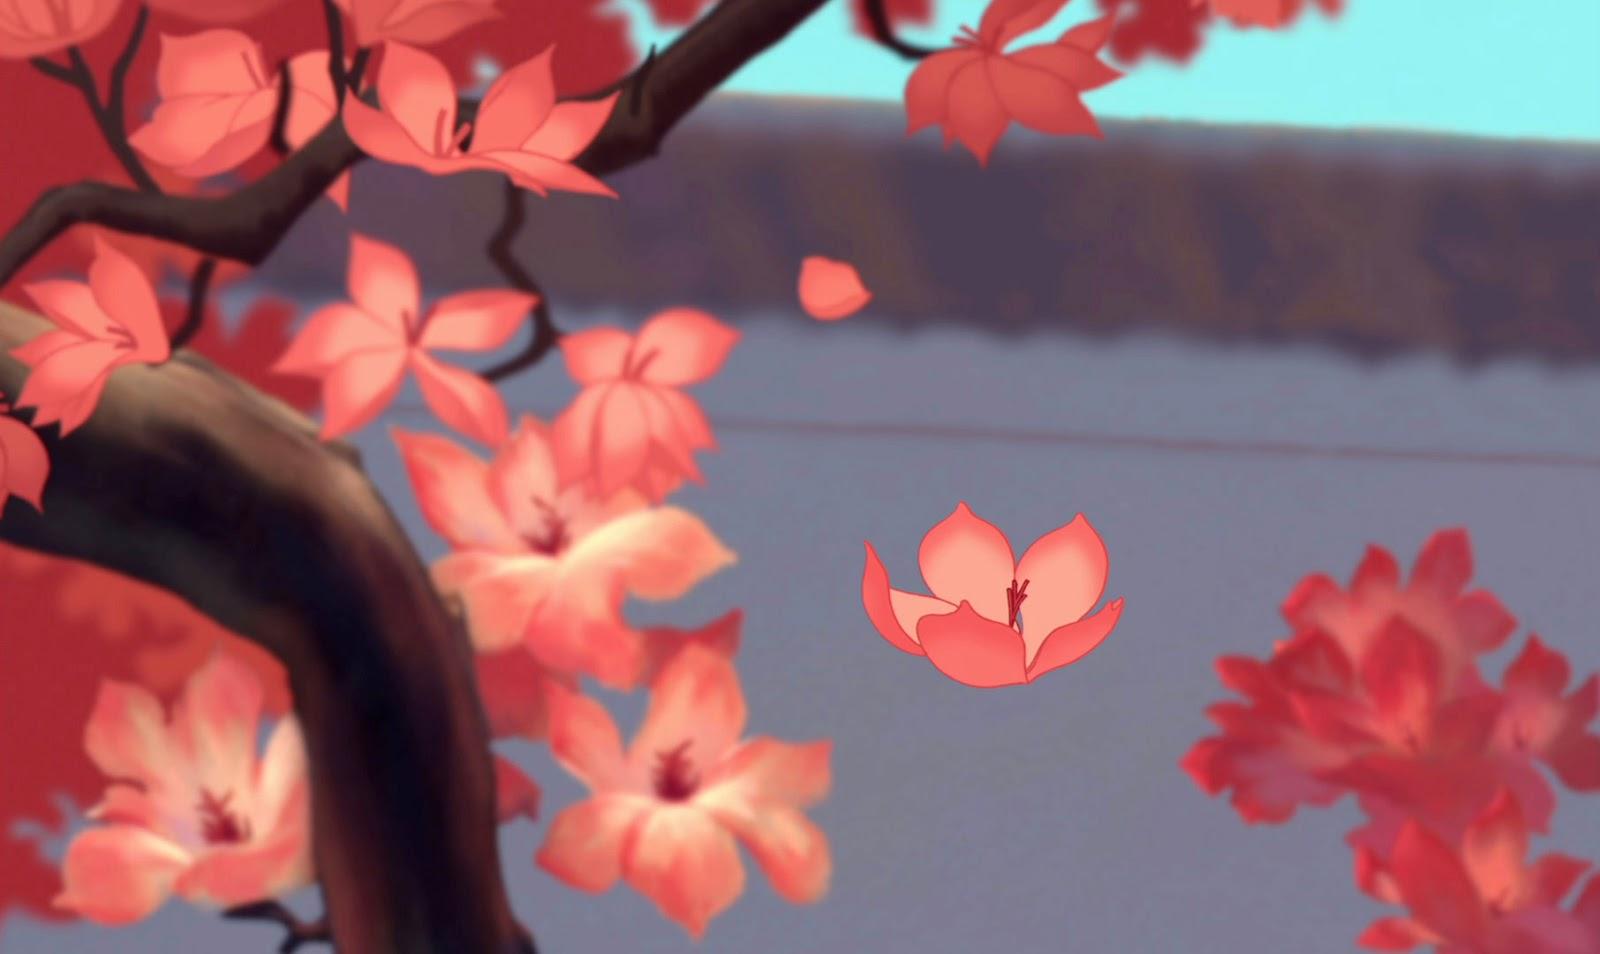 mulan the flower that blooms